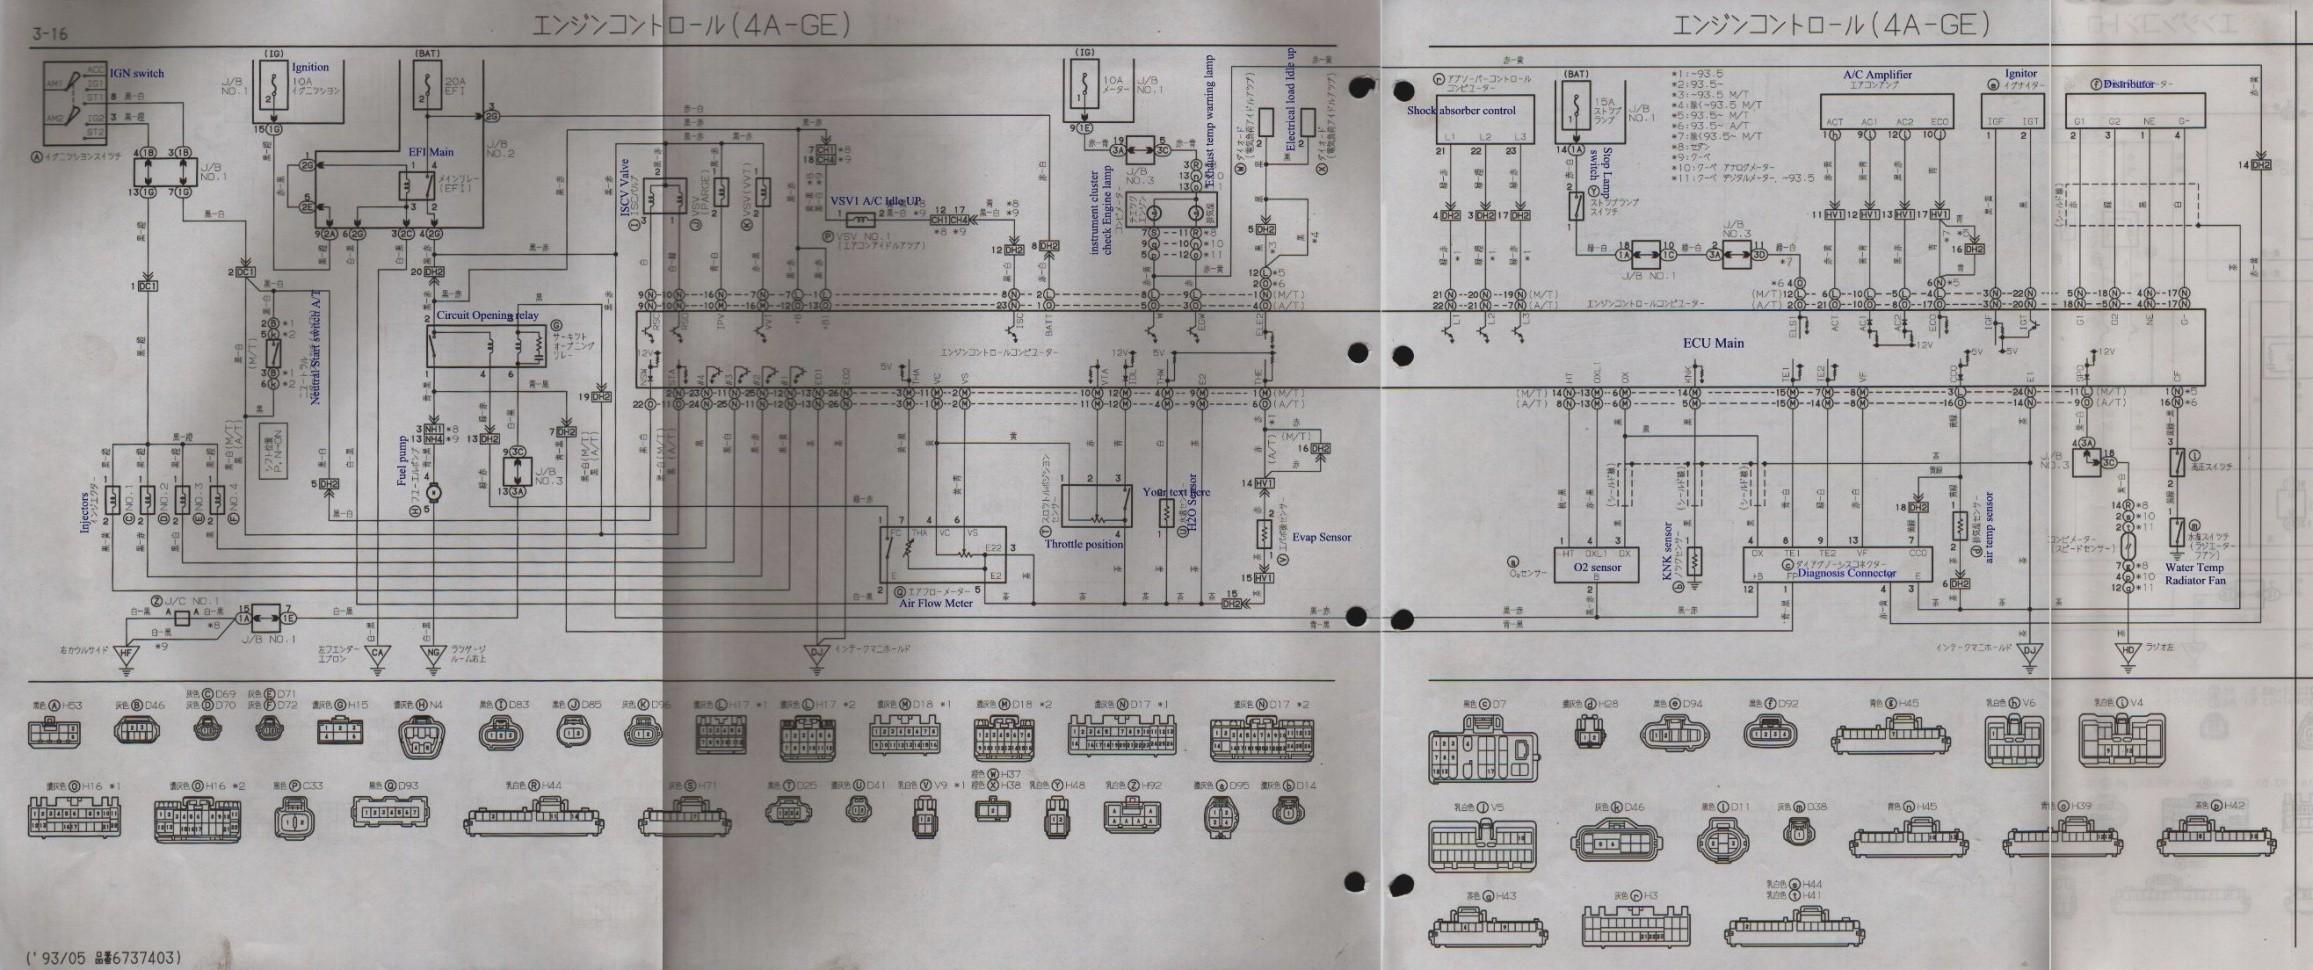 Beautiful Ae111 Wiring Diagram 20V Swap Reference Qr GaraGe